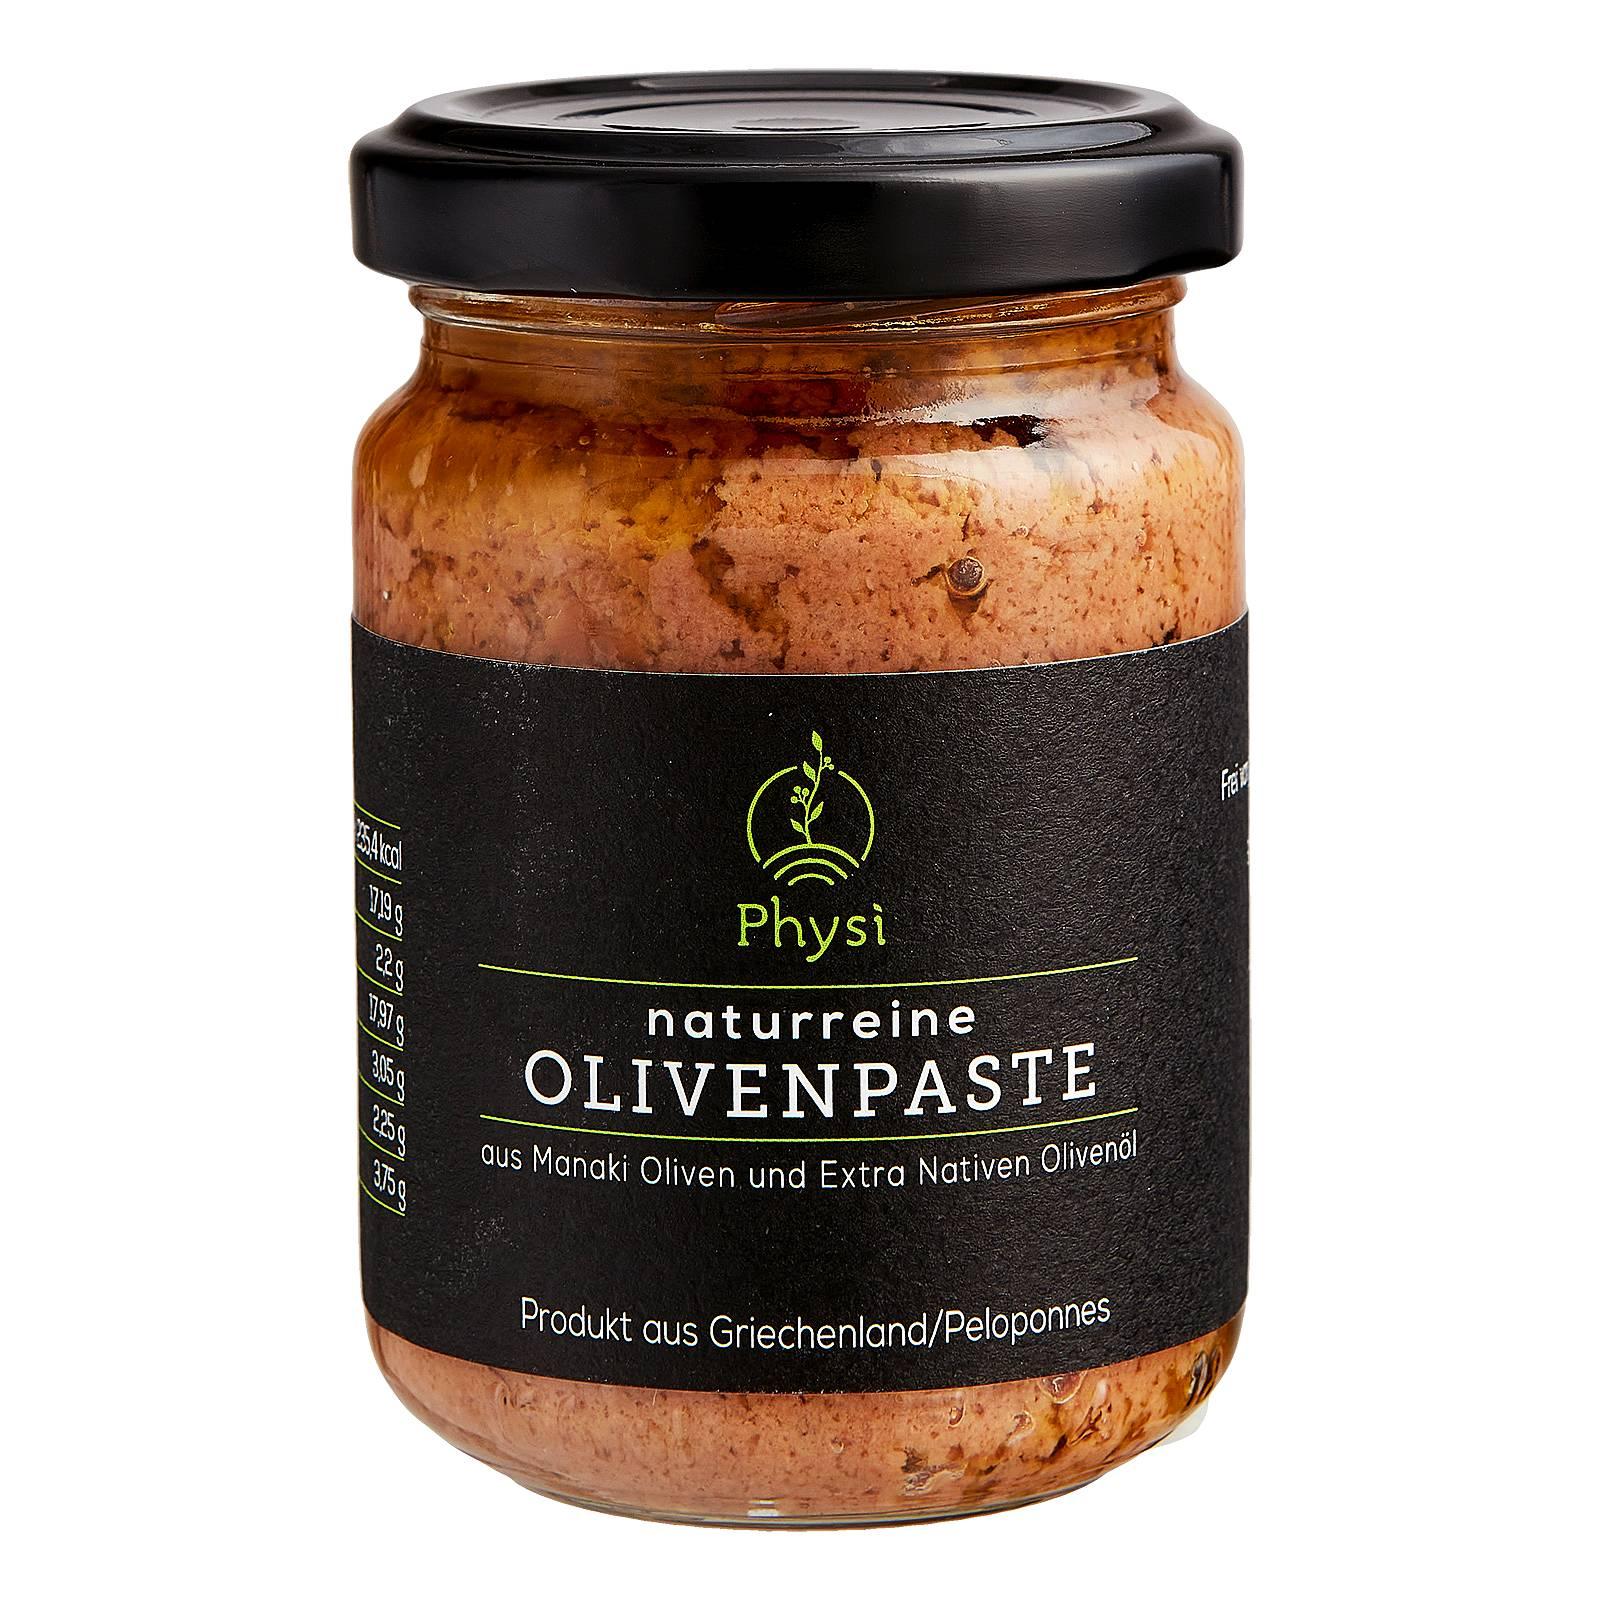 Olivenpaste aus Manaki Oliven